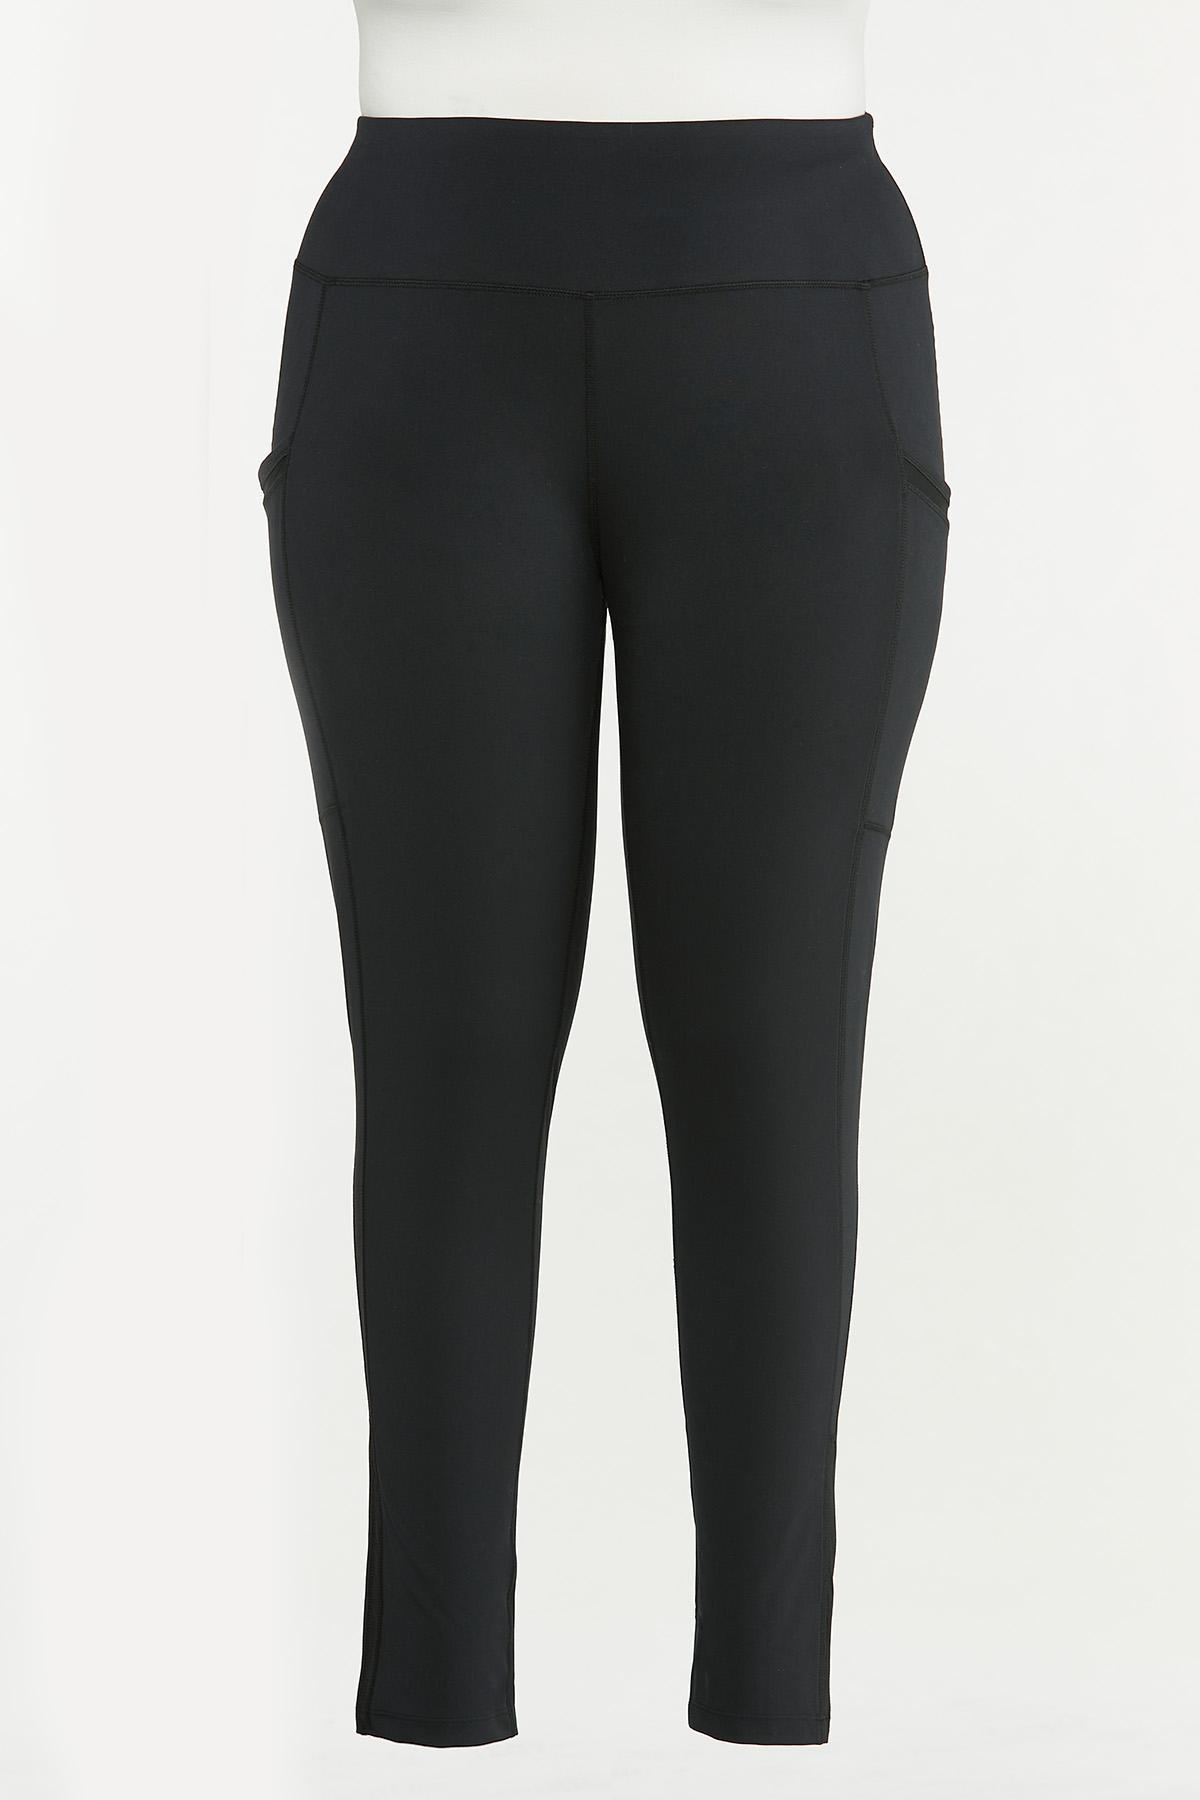 Plus Size Pocket Leggings